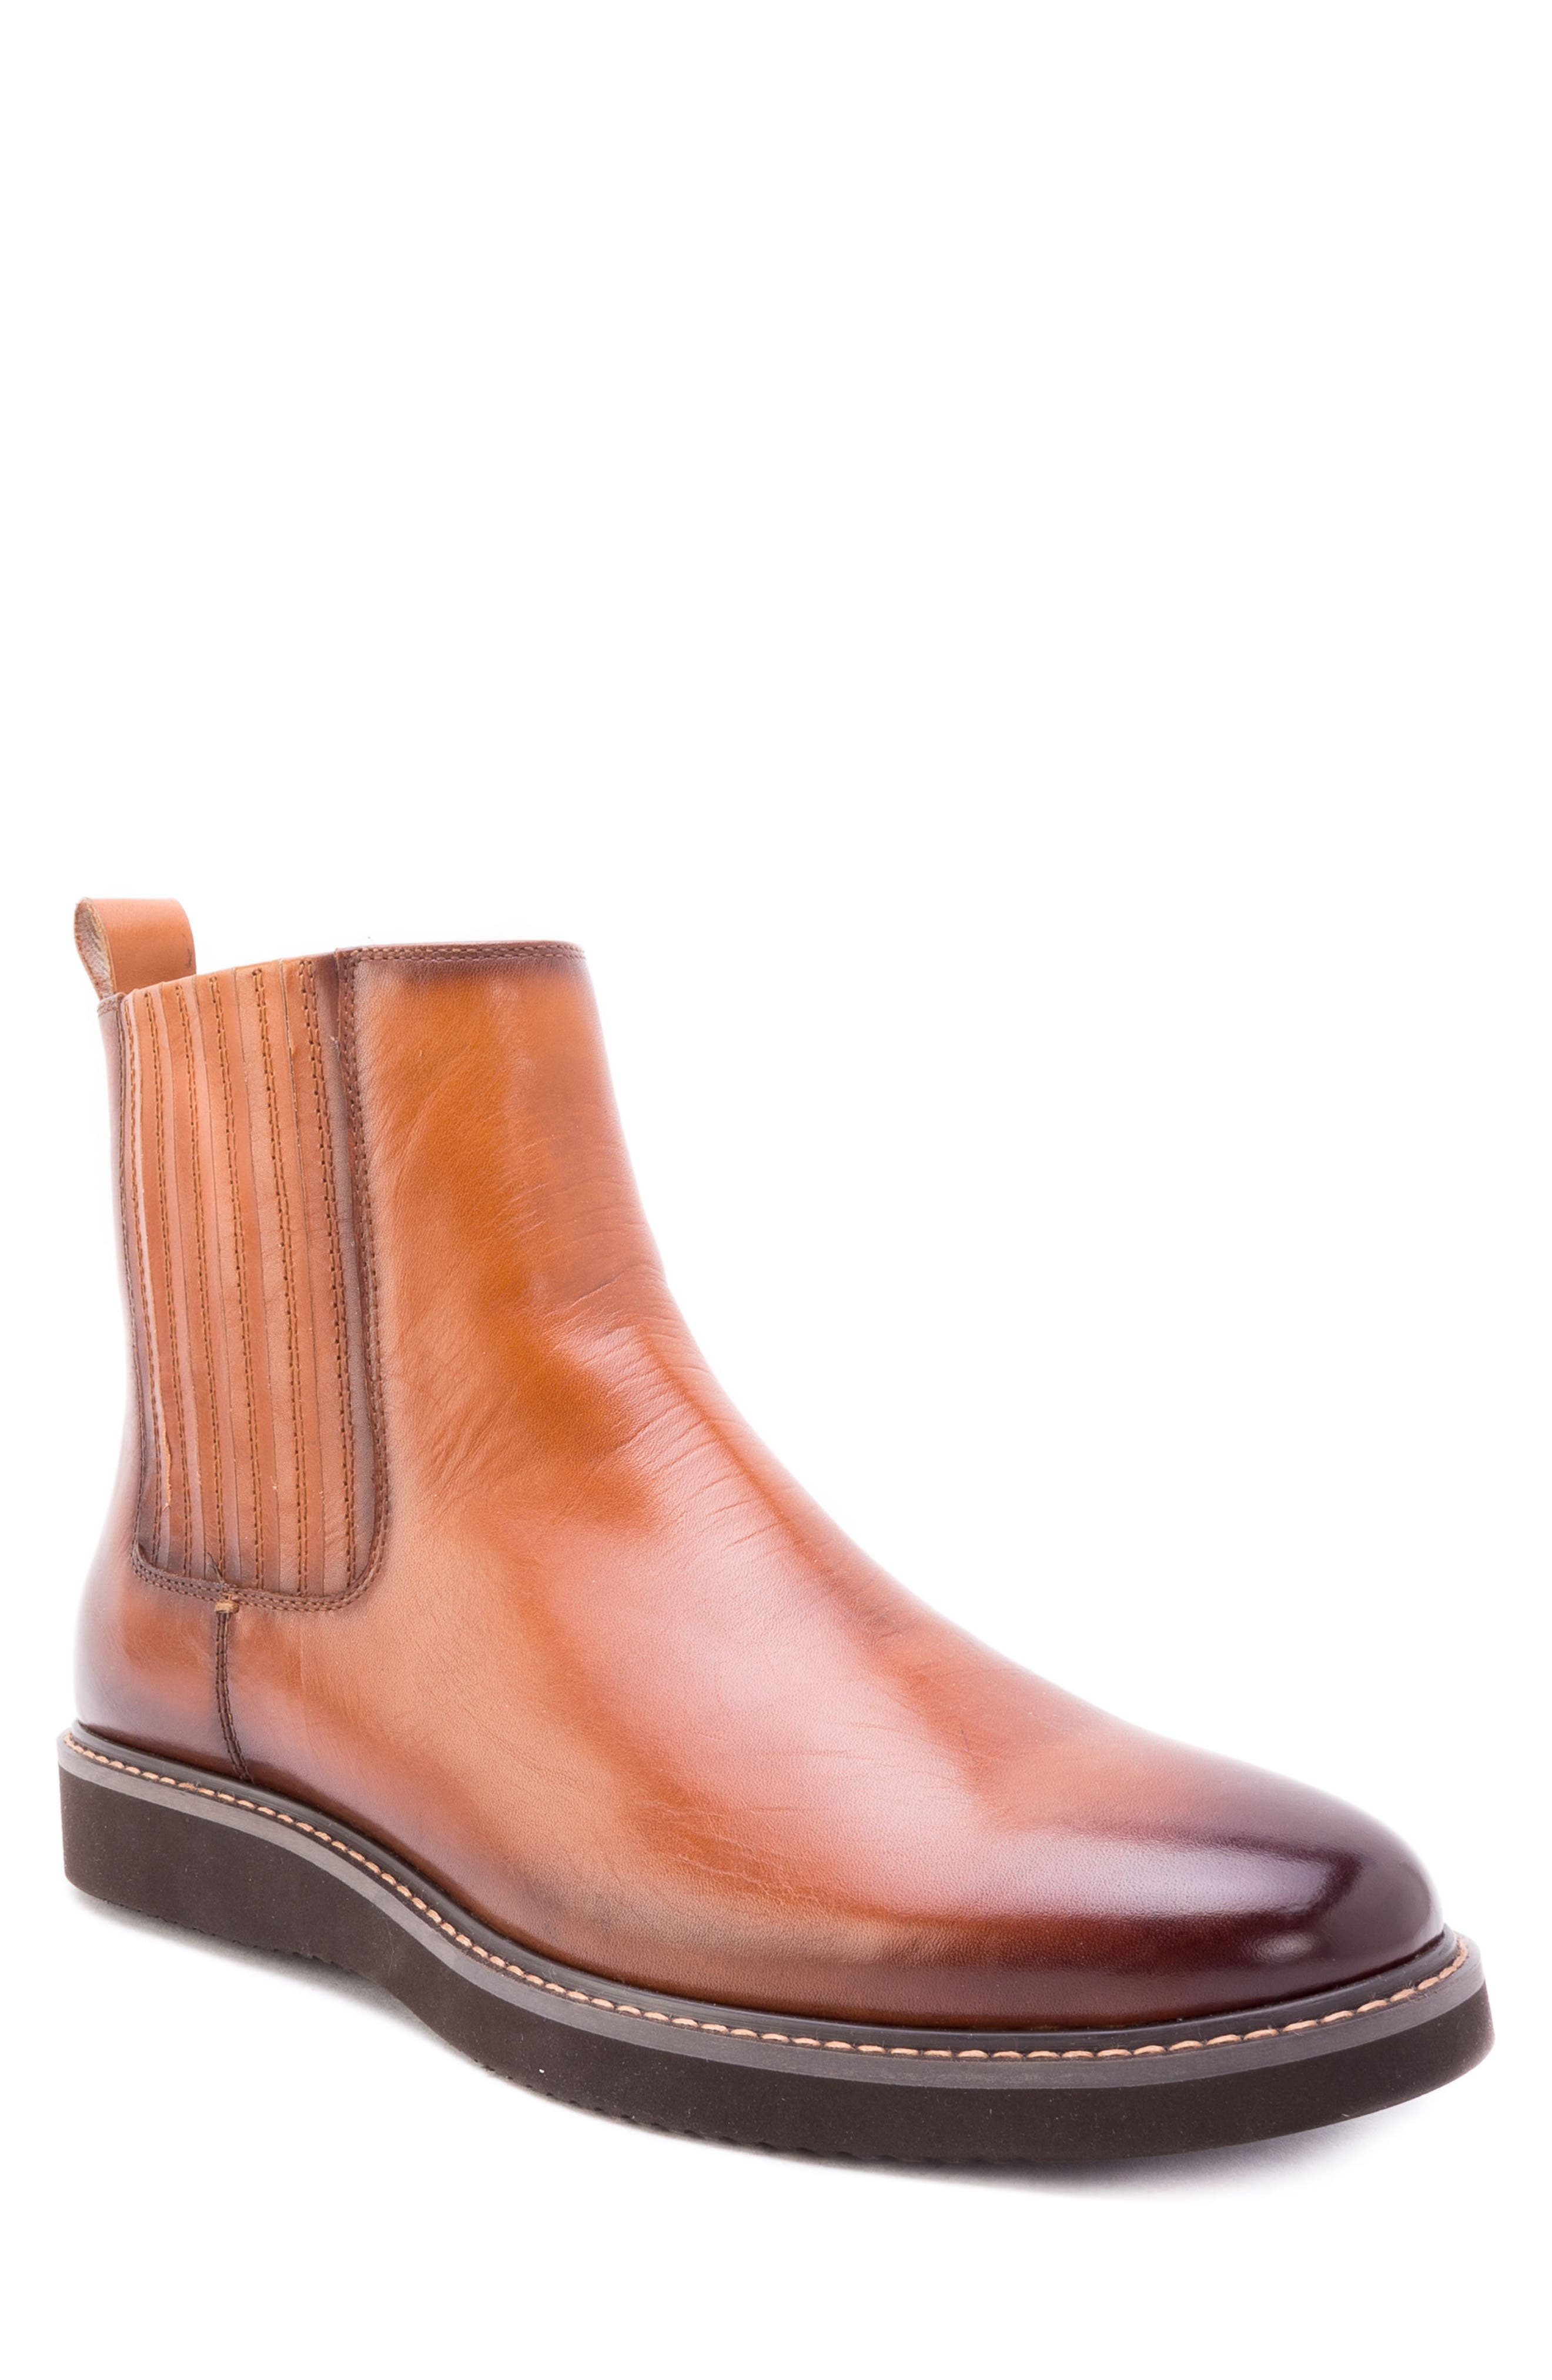 Zanzara Warlow Chelsea Boot- Brown